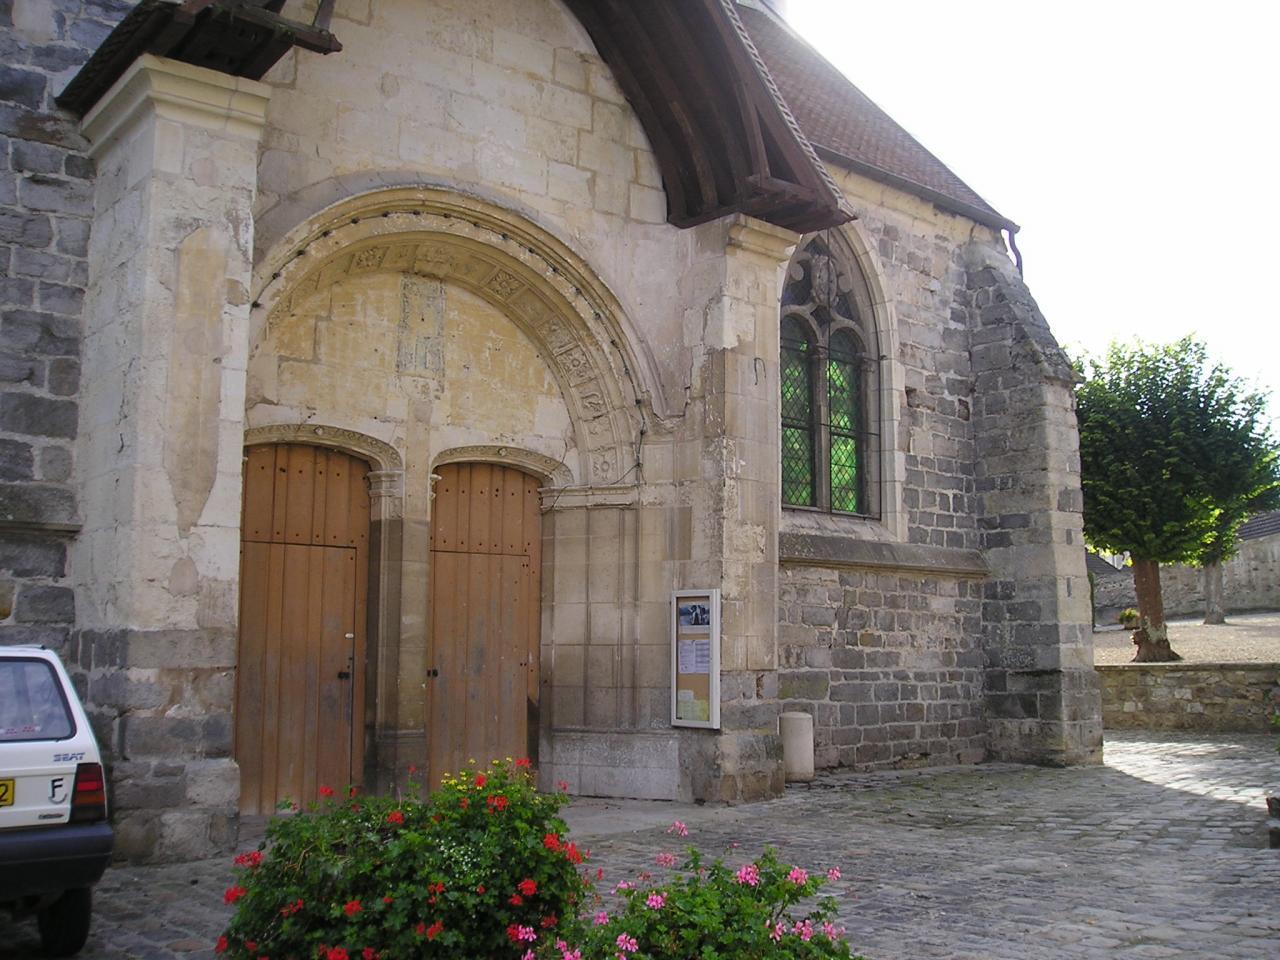 Chézy sur Marne (Aisne) Eglise Saint Martin en 2004